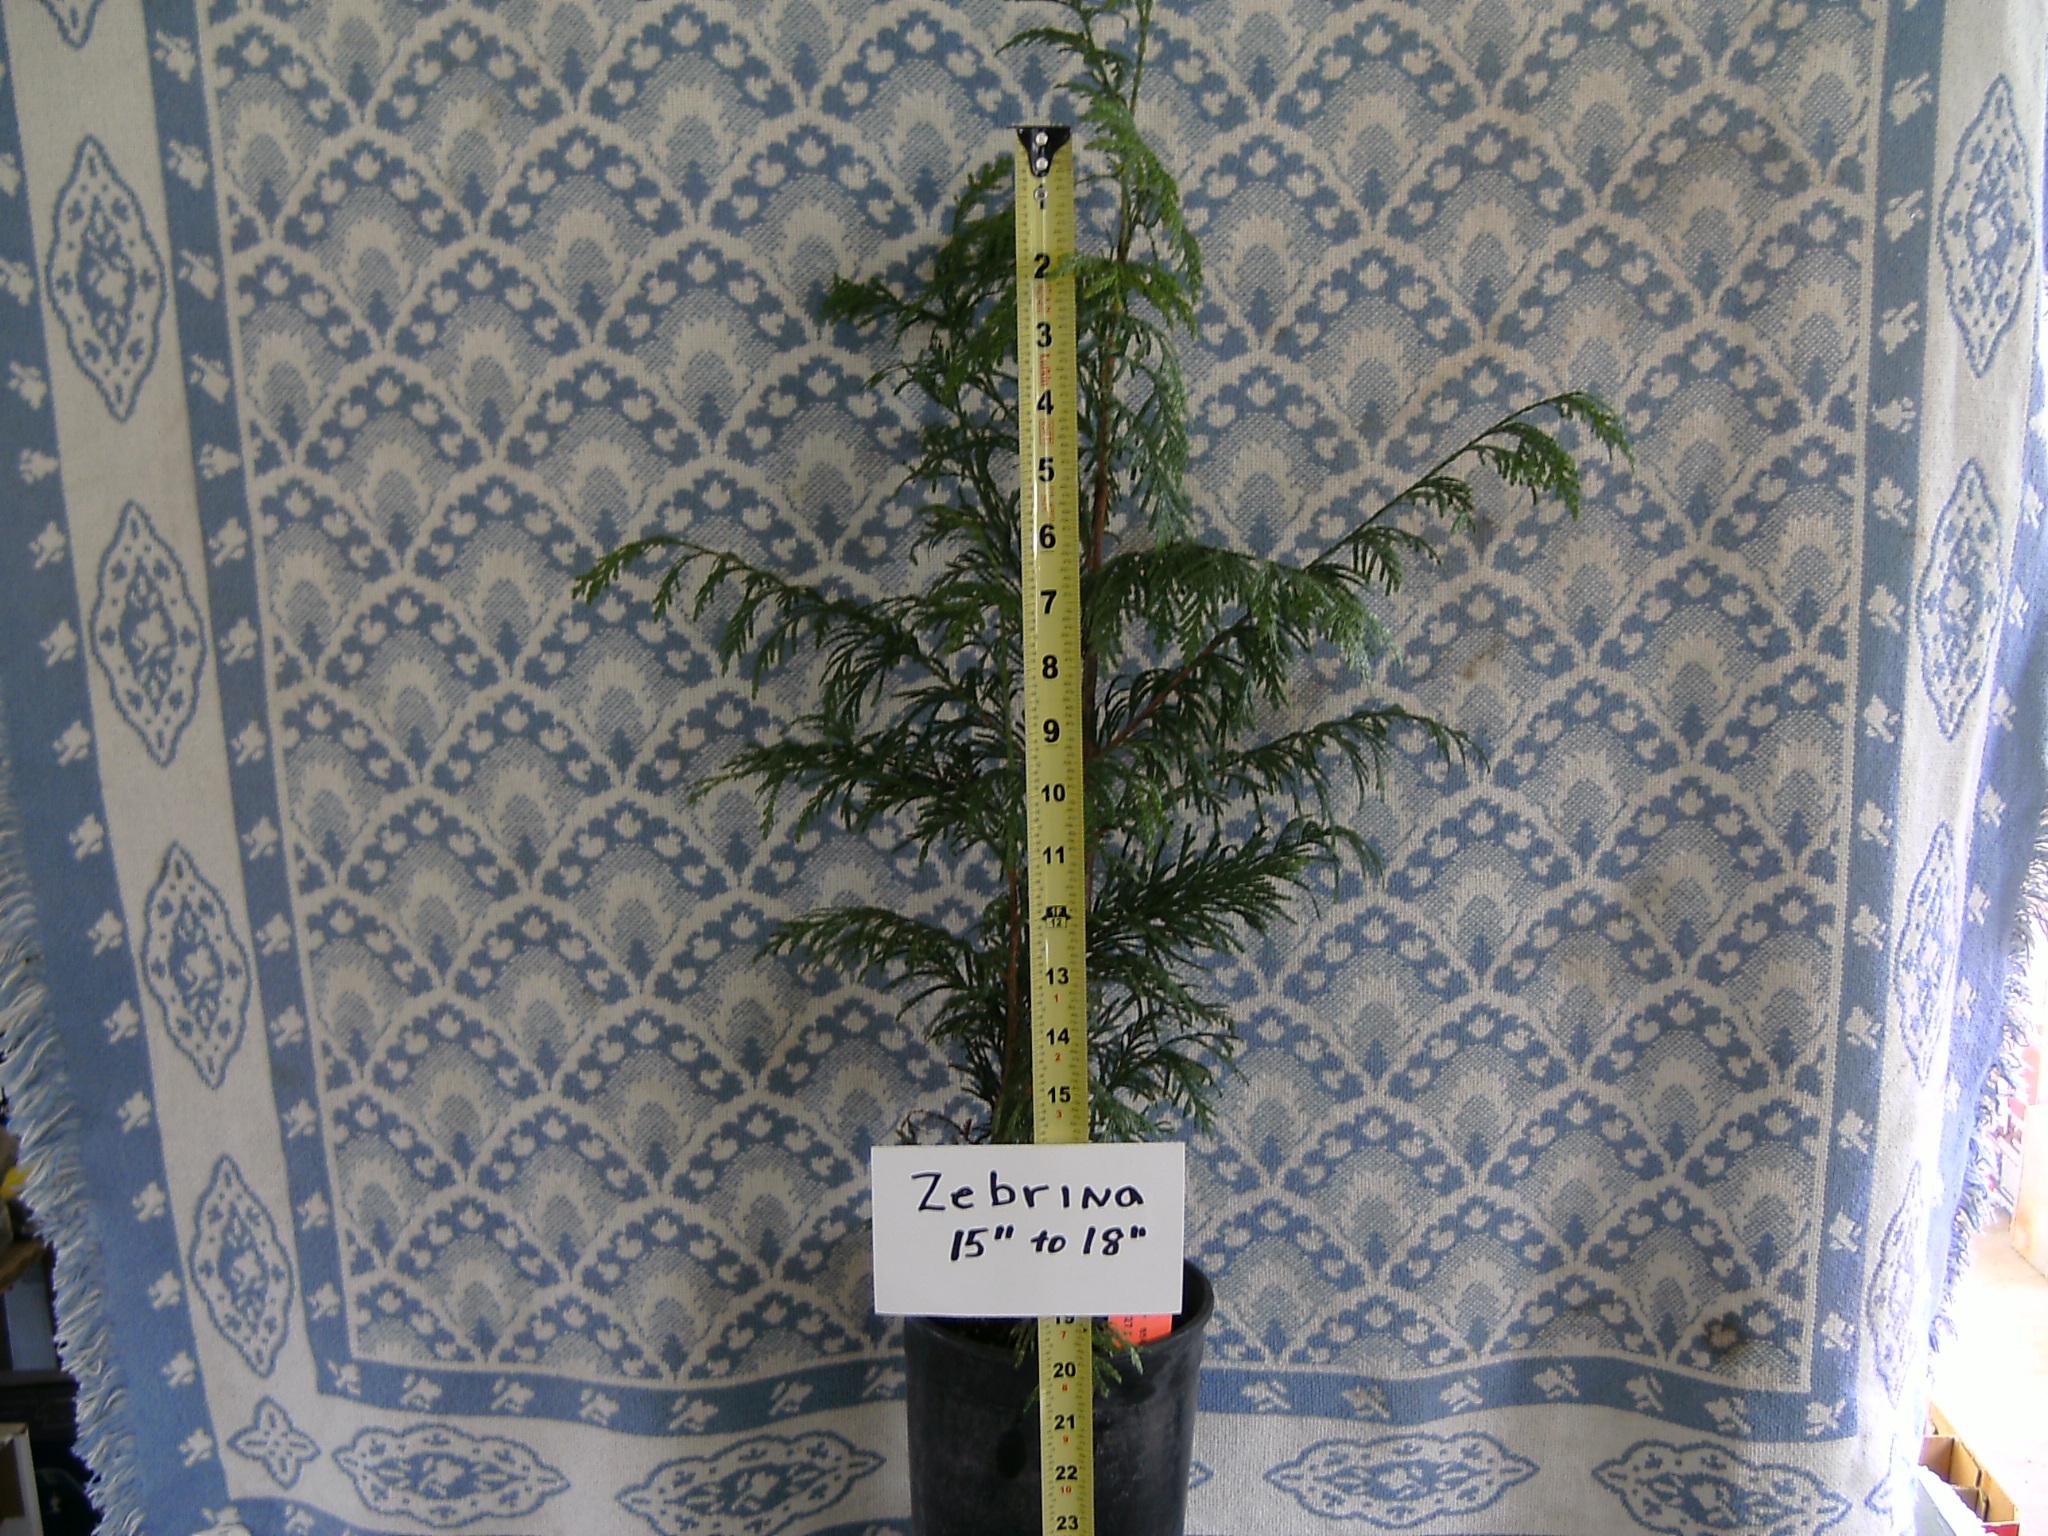 Our 15-18 inch tall Zebrina Arborvitae Liner